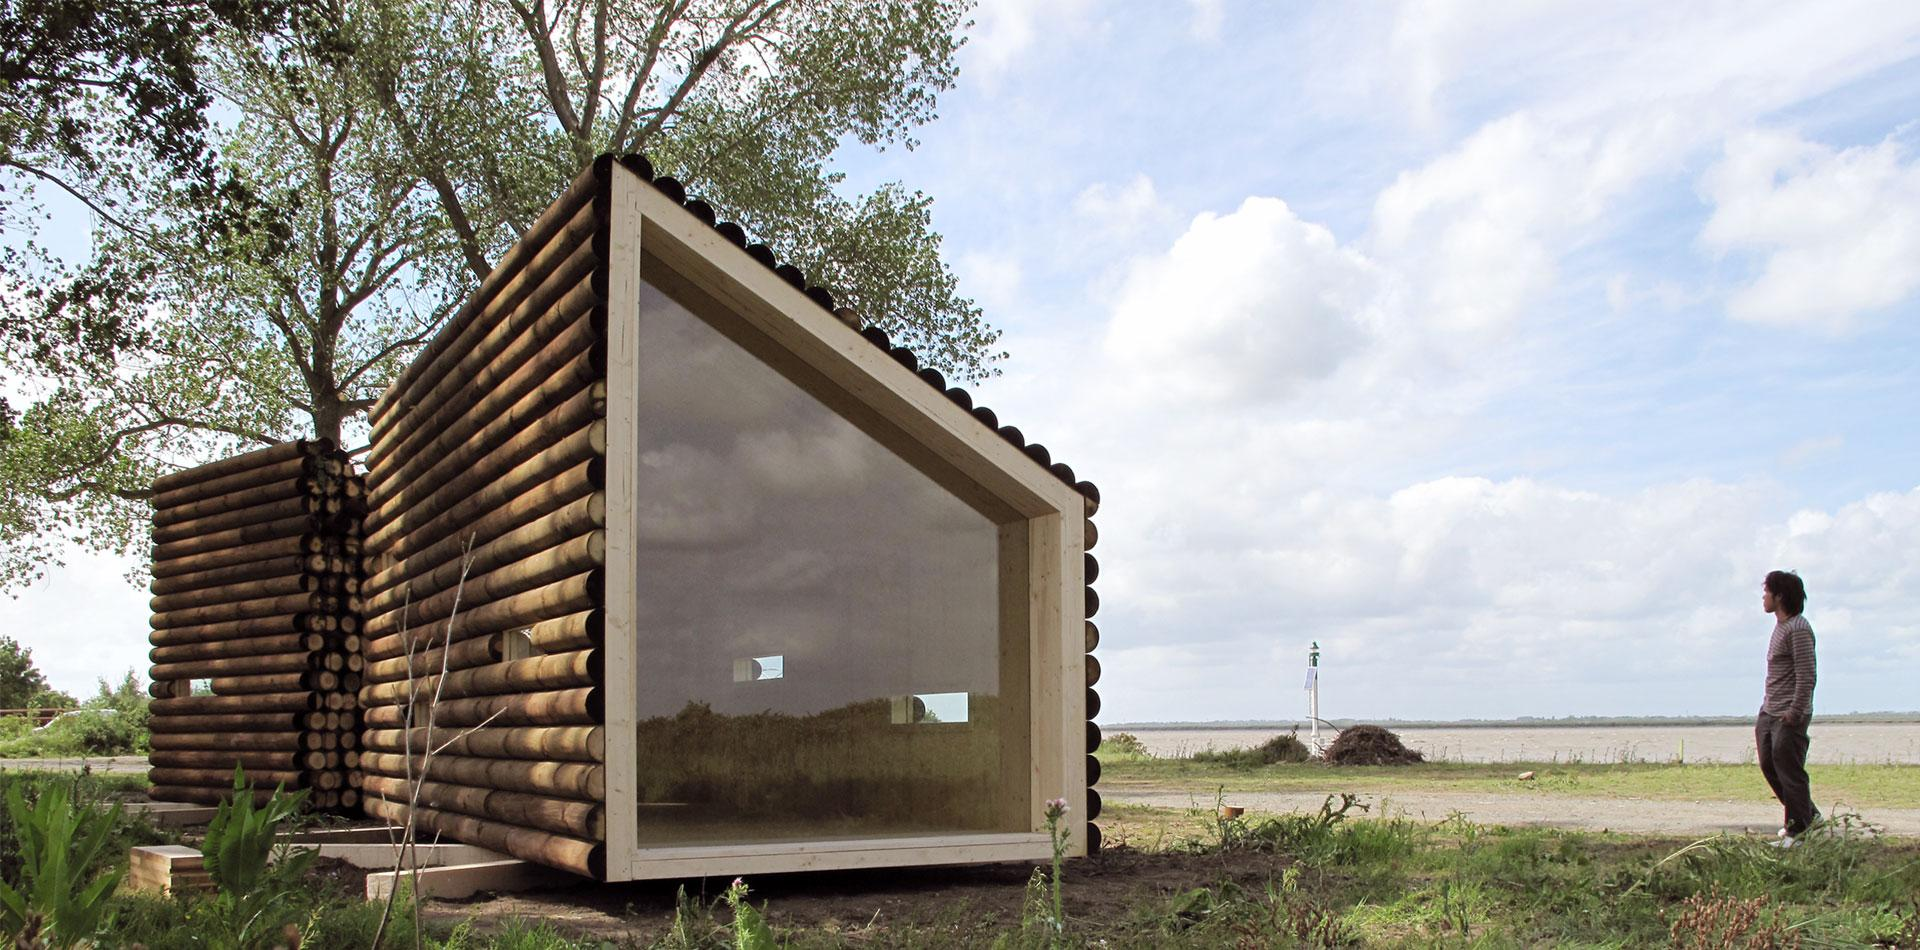 Steel frame prefab homes modular tiny buildings cool for Prefab steel house